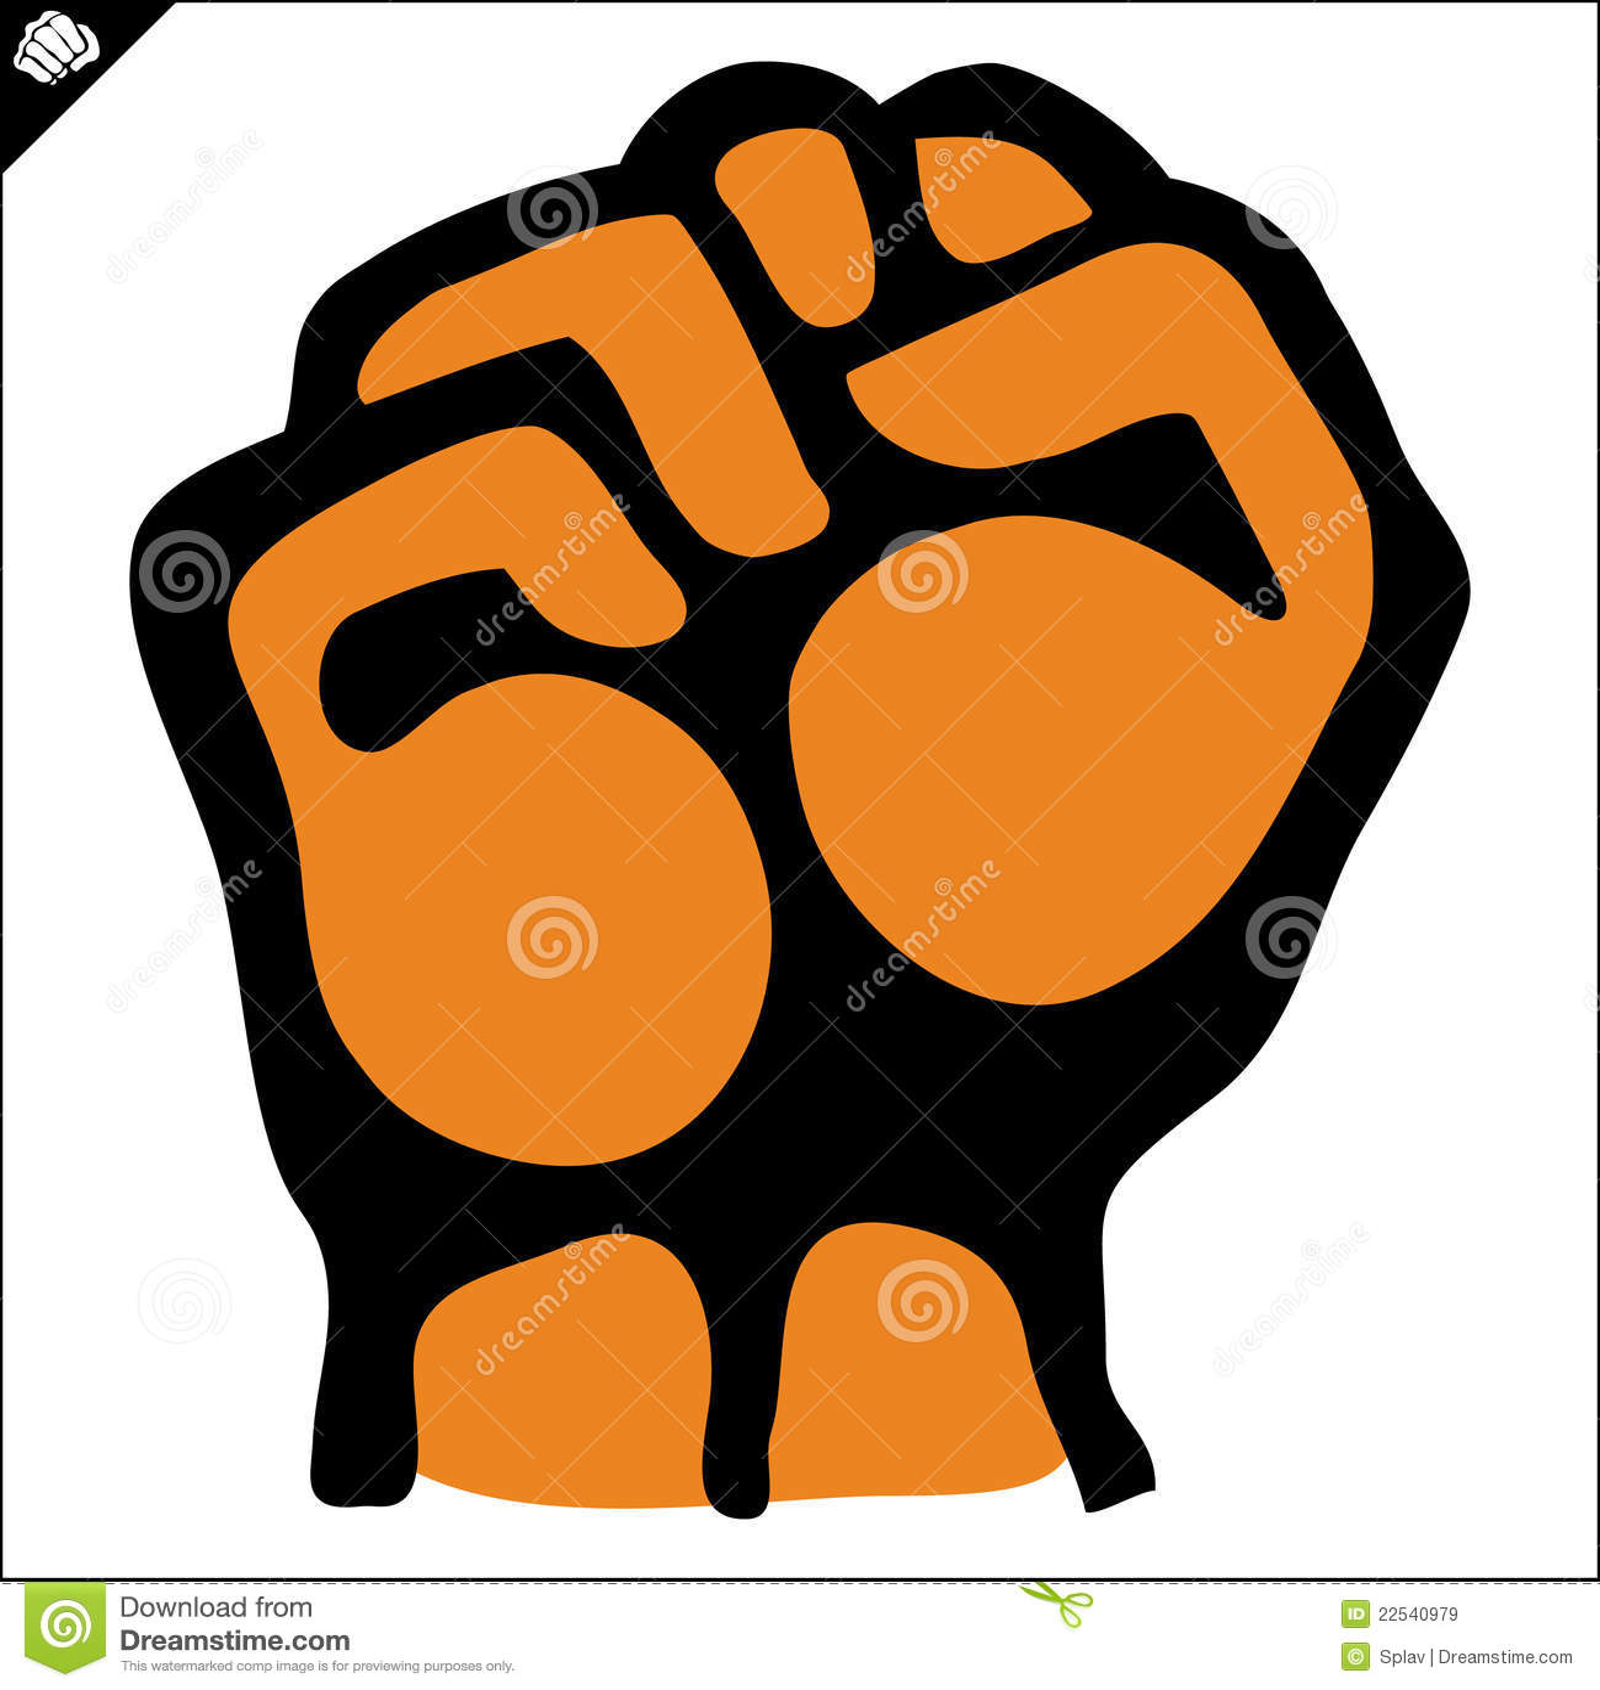 Art of fisting-4531